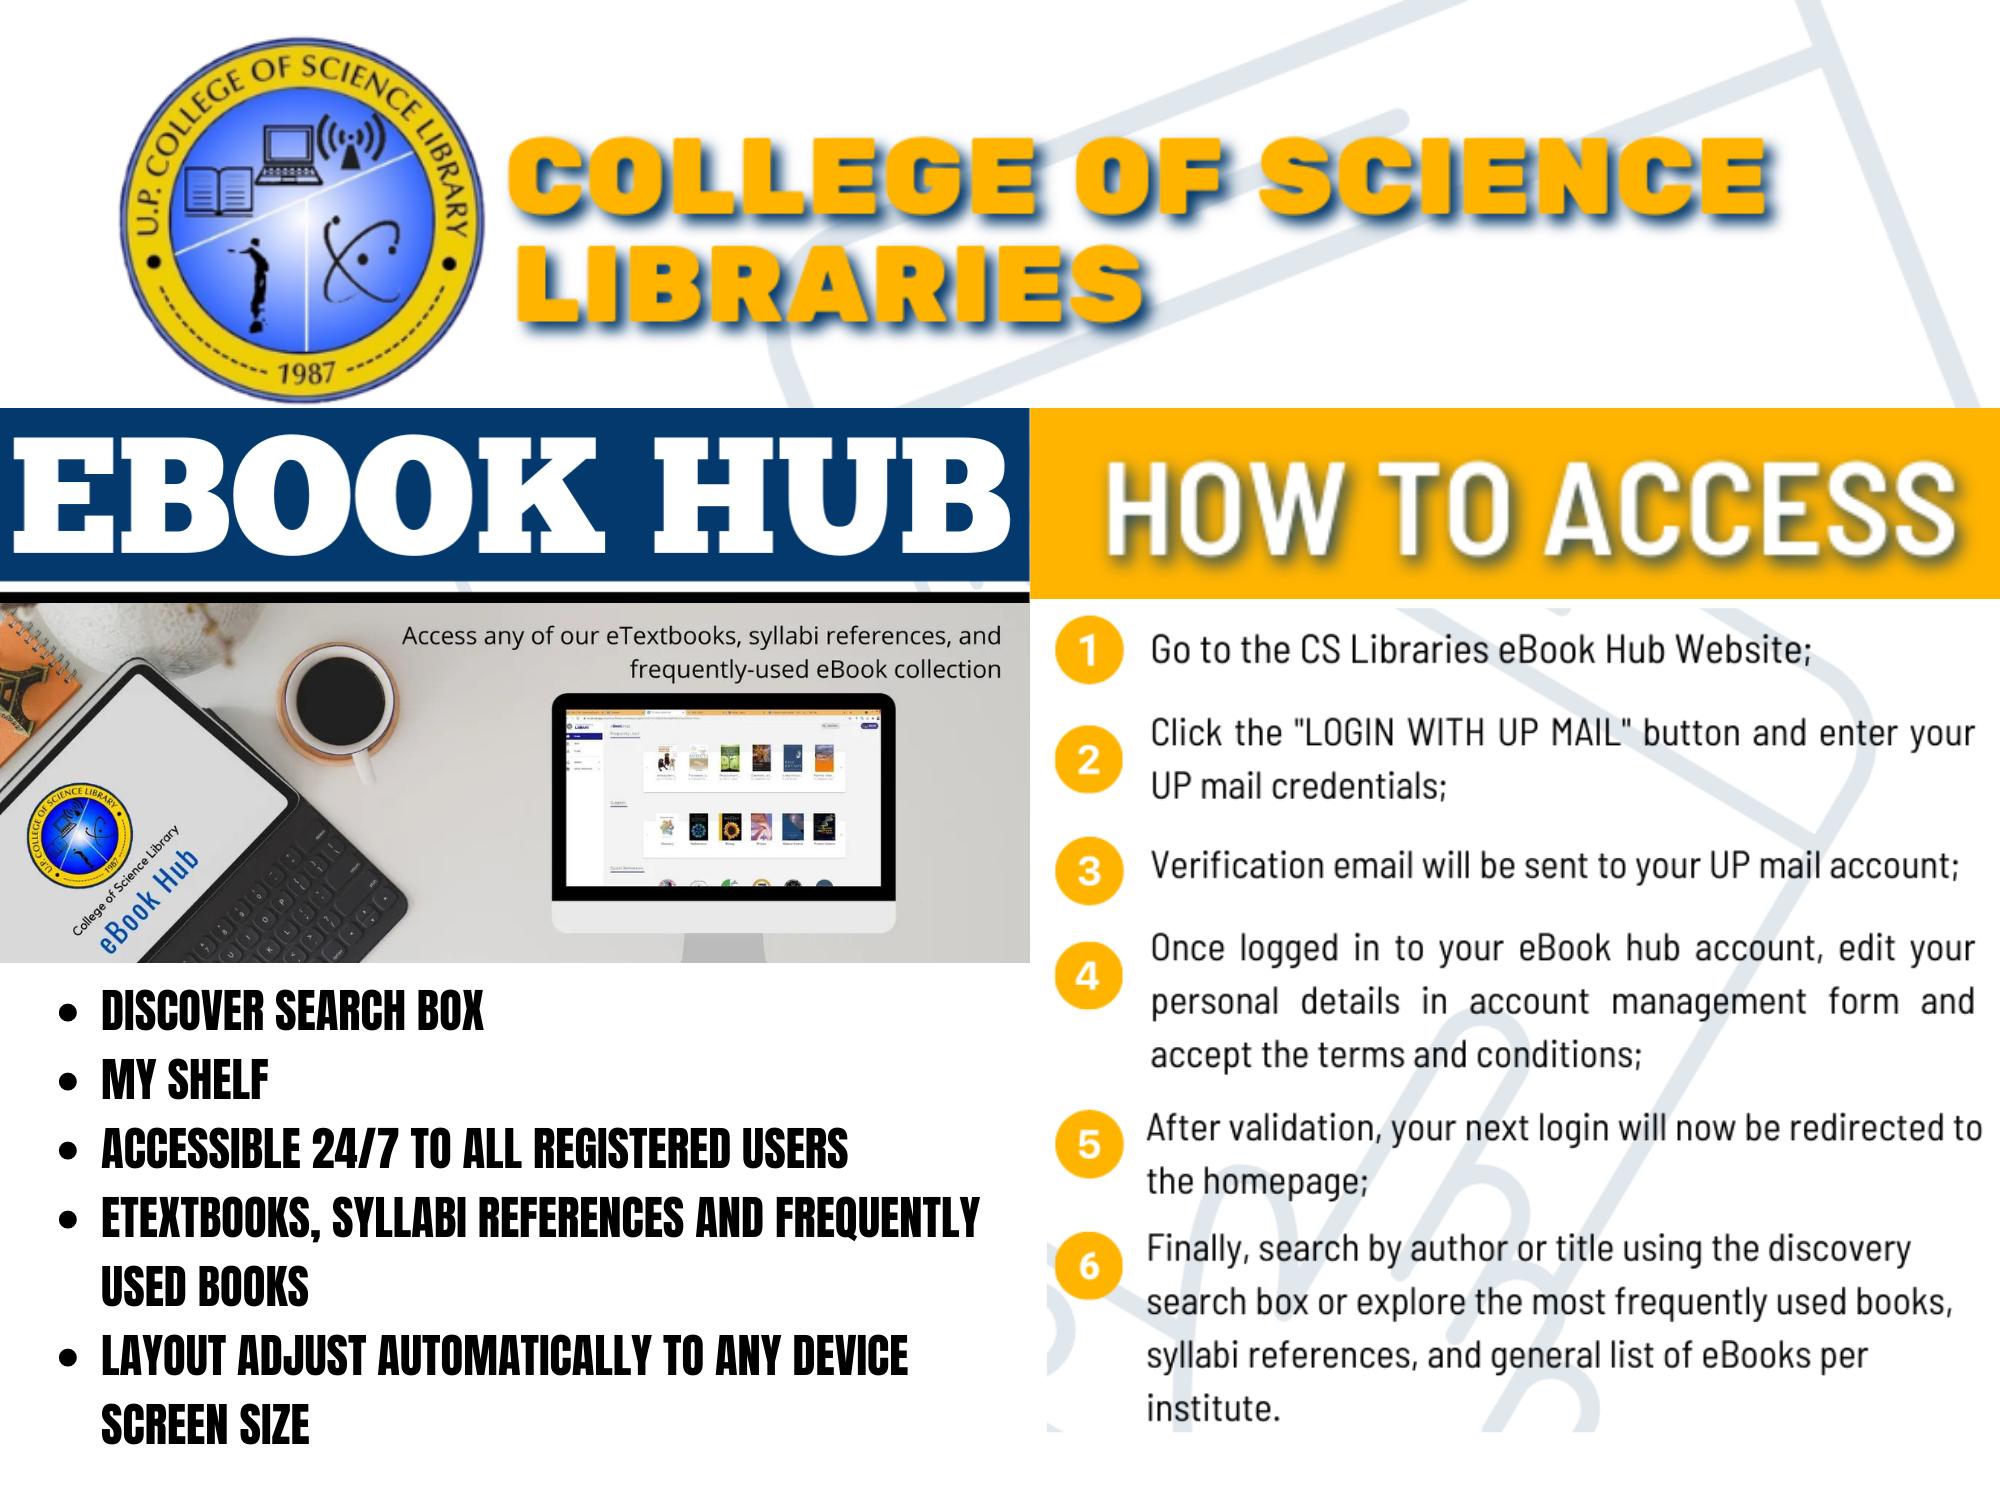 CS Libraries eBook Hub